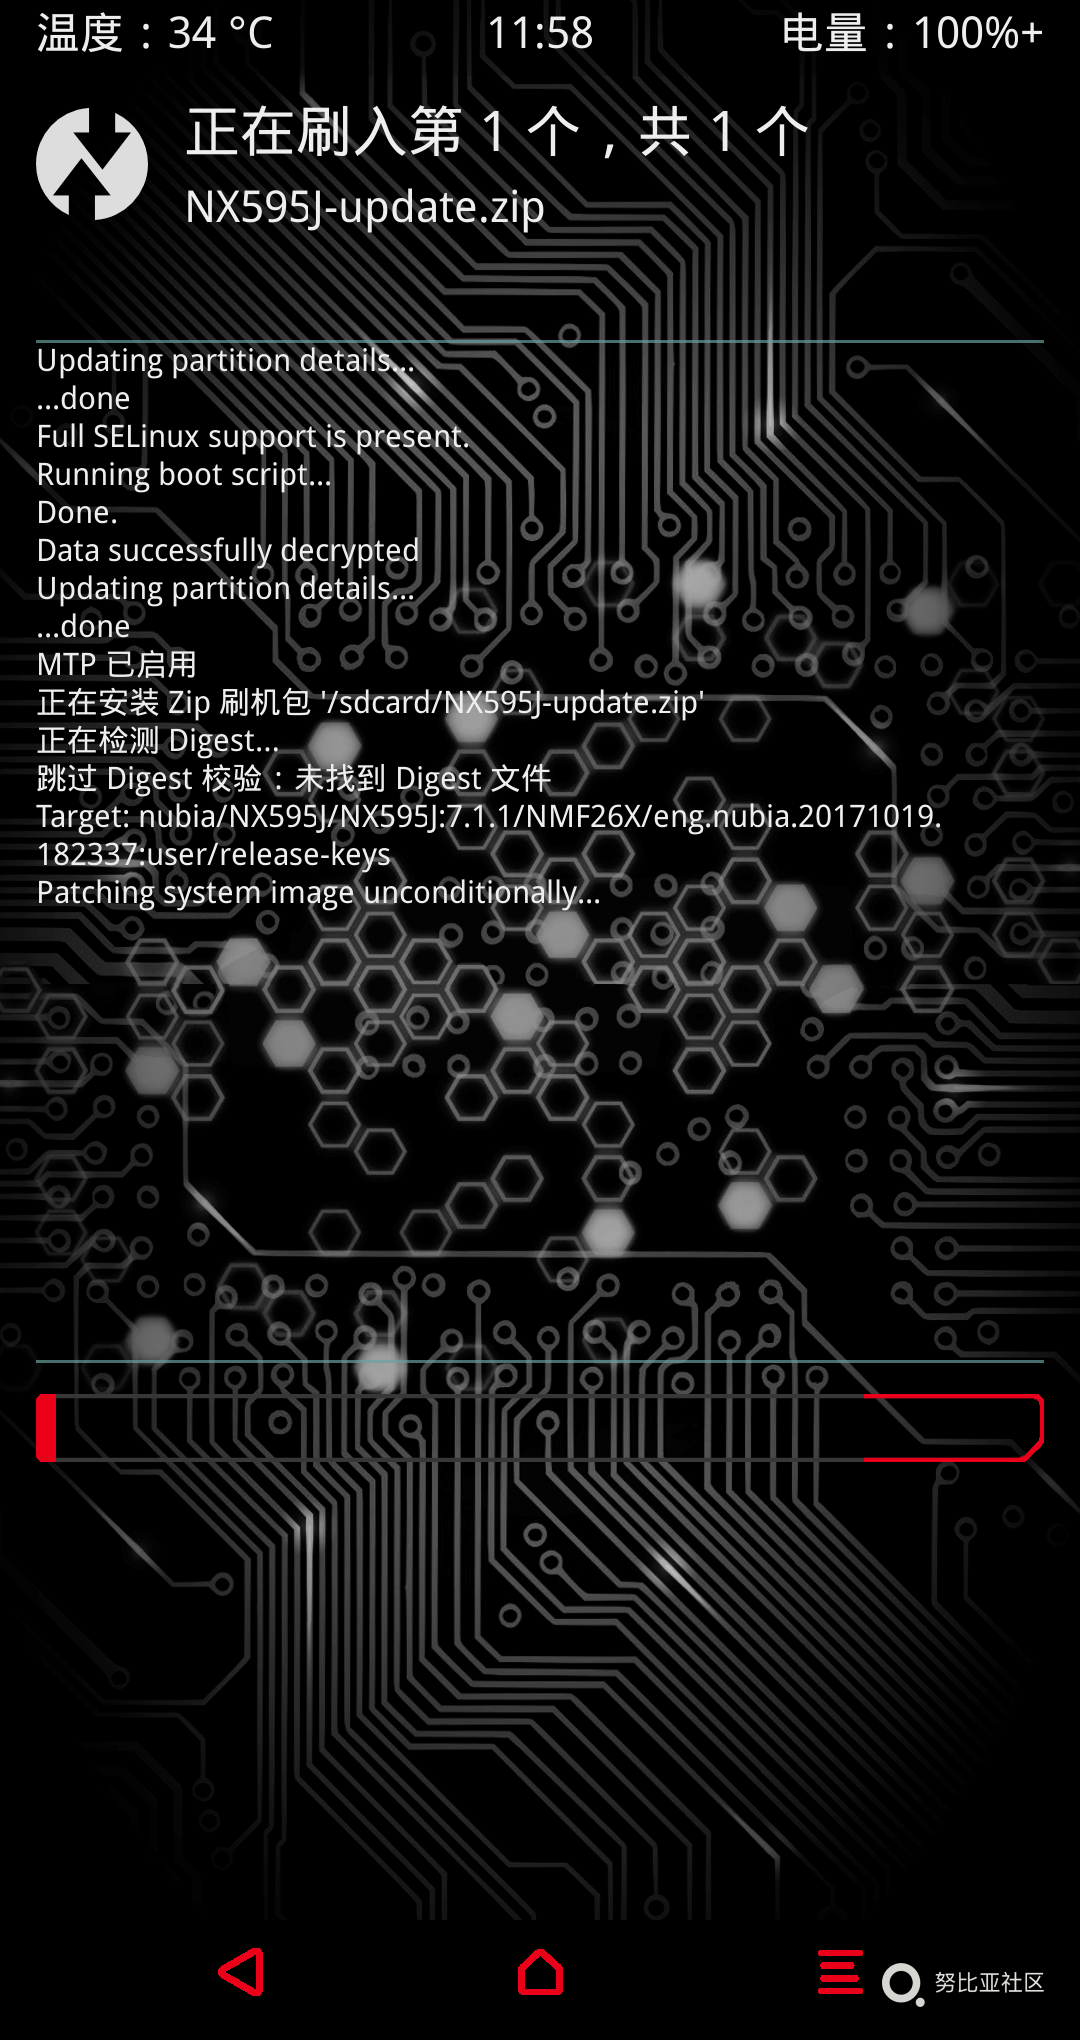 Screenshot_2012-11-04-11-58-41.png